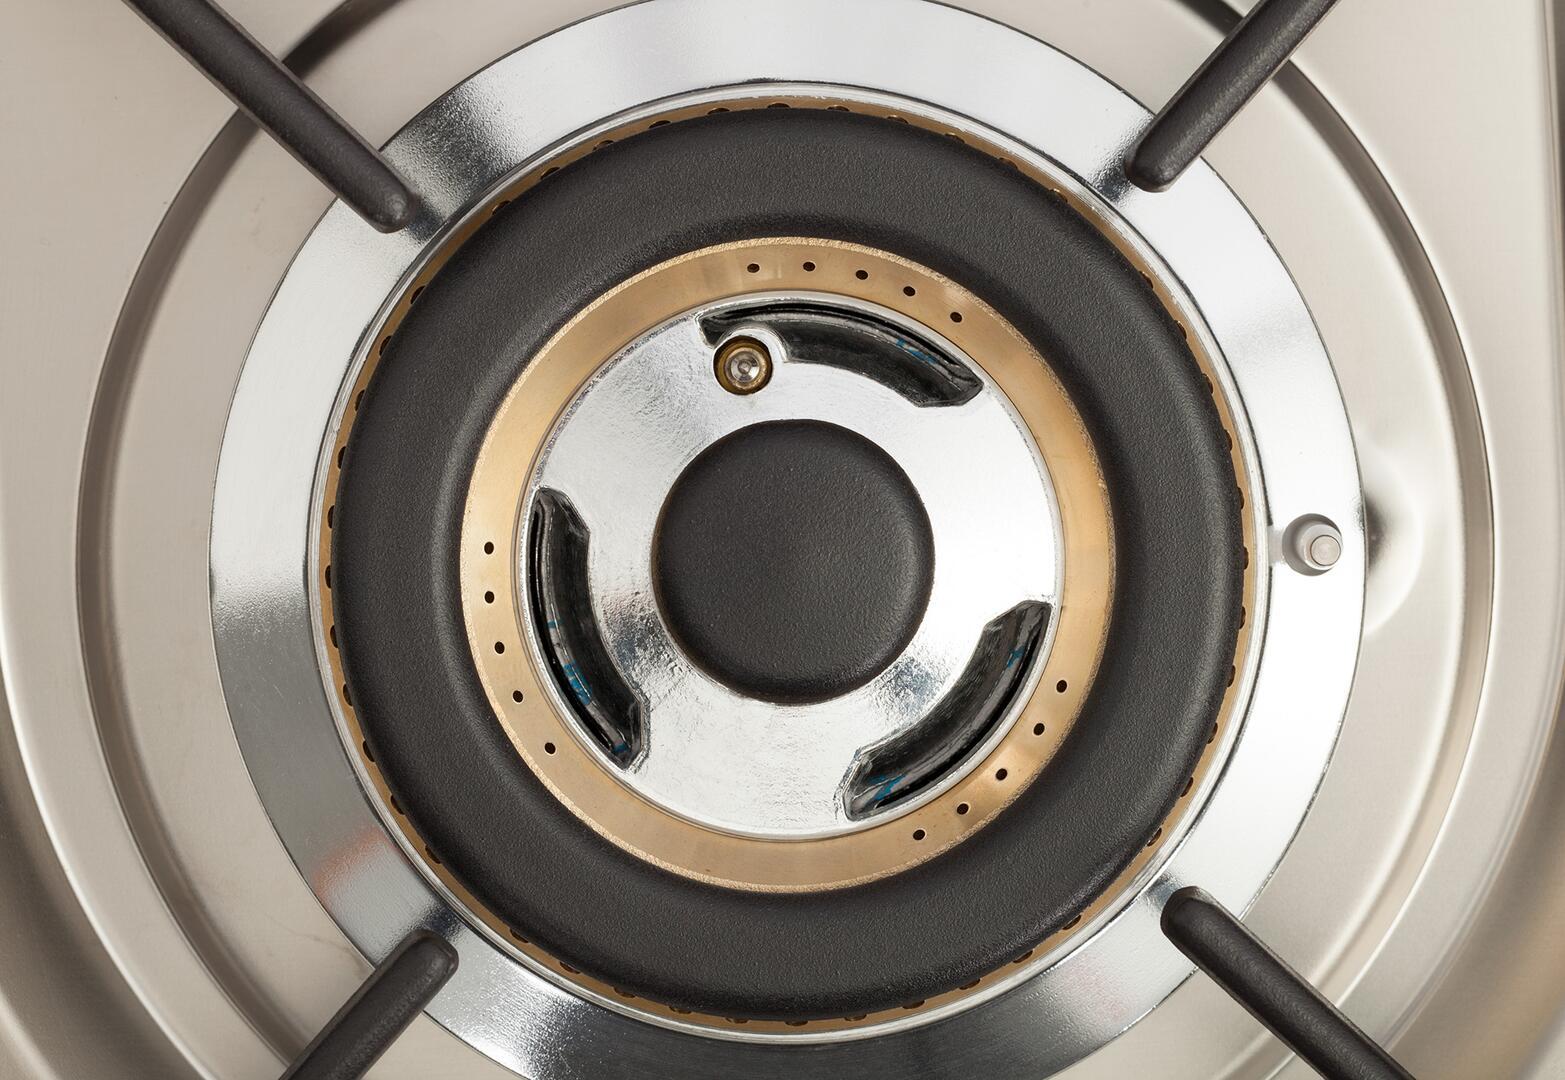 Ilve Nostalgie UPN90FDMPBL Freestanding Dual Fuel Range Blue, Triple Ring Buner Top View